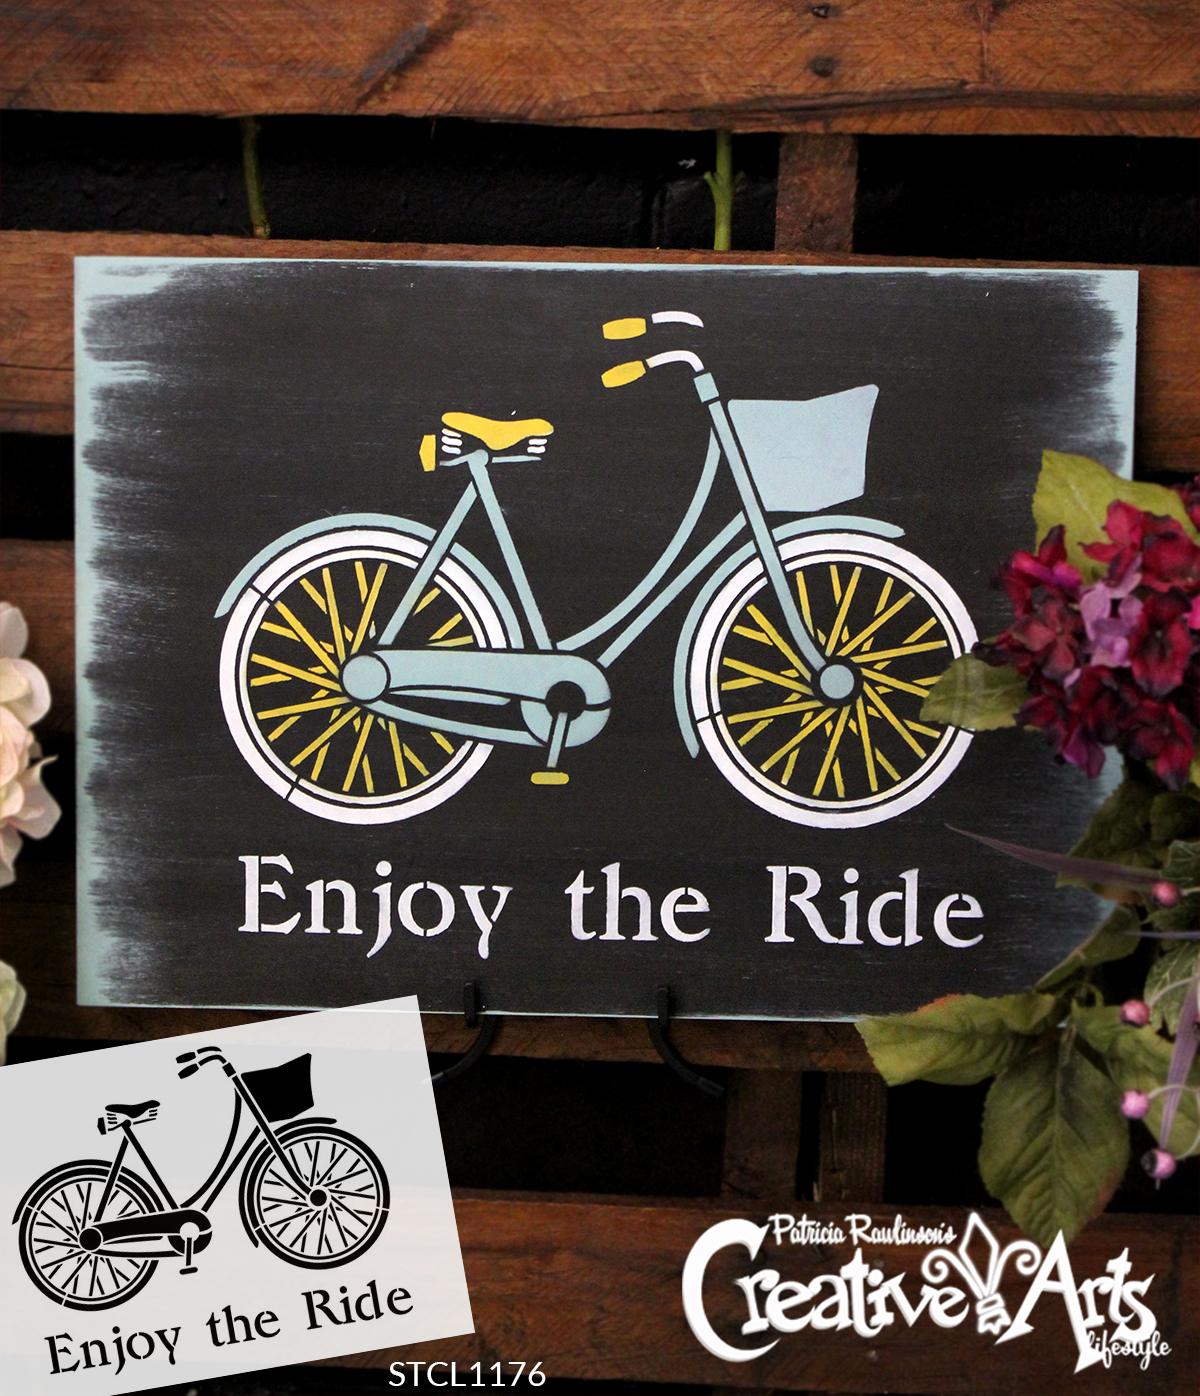 "Enjoy the Ride - Word Art Stencil - 19"" x 13.5"" - STCL1176_2"